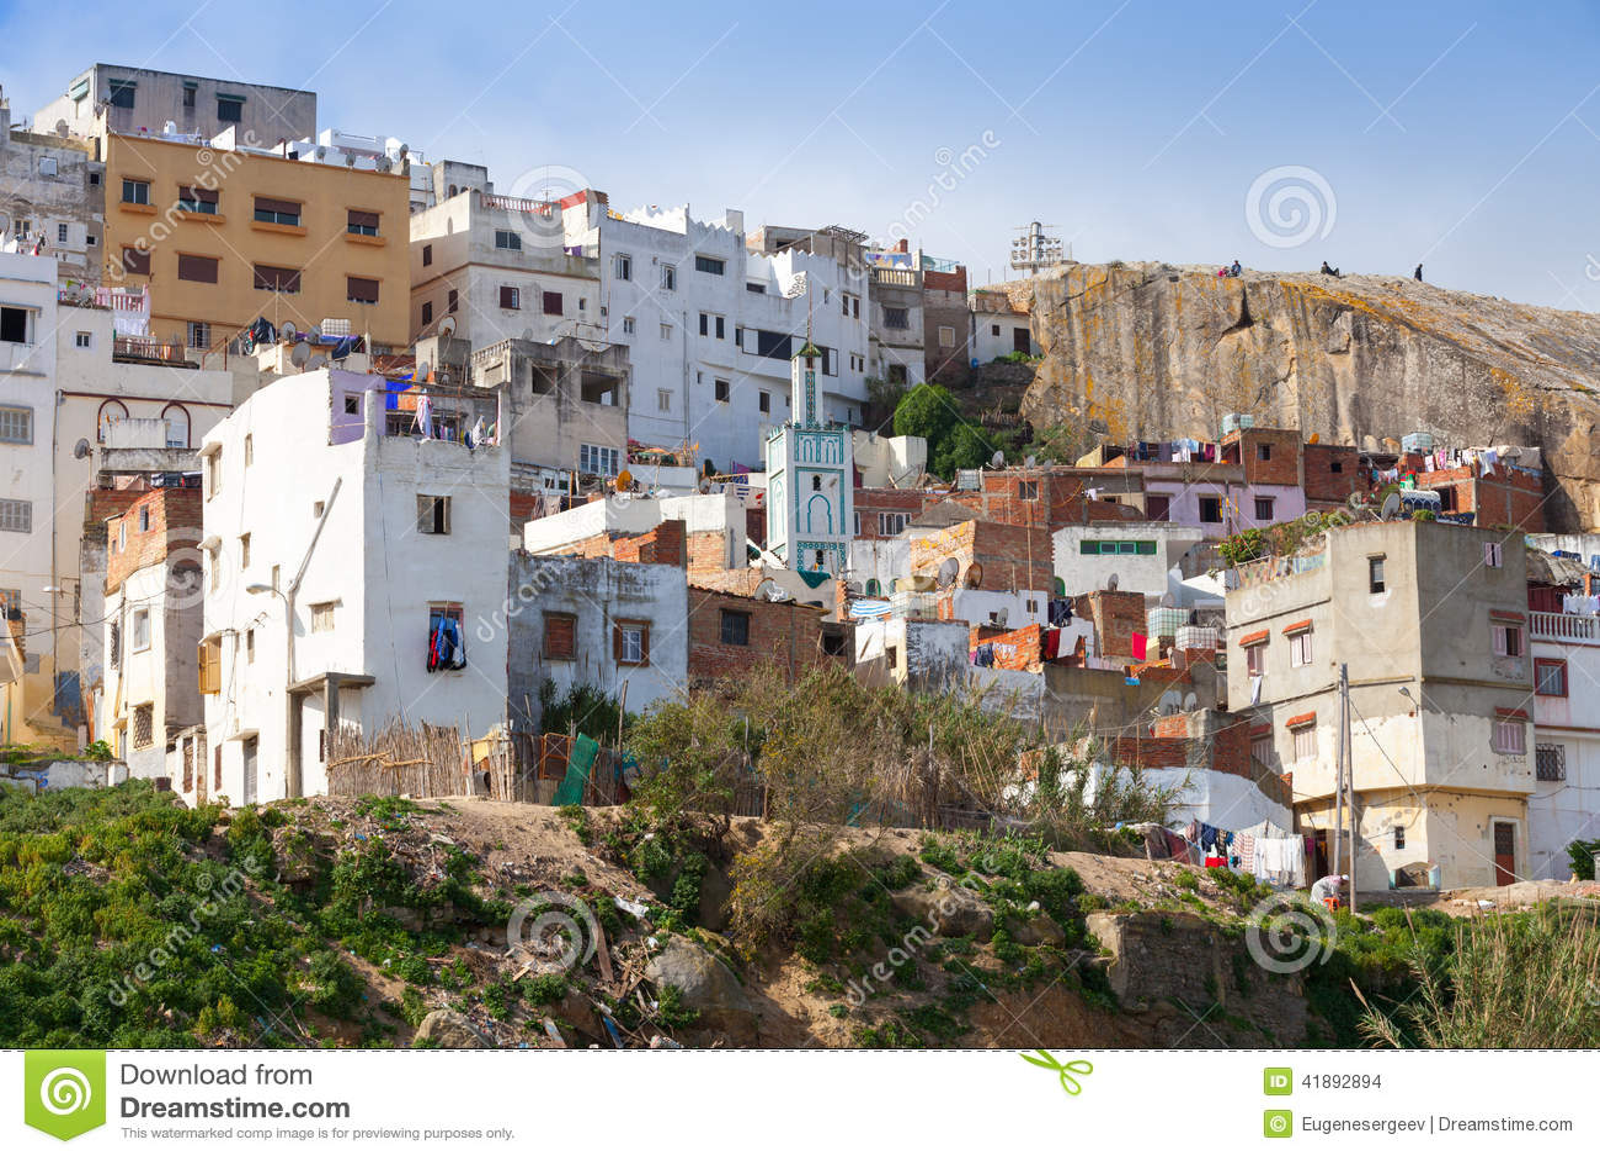 tangier marokko alte bunte lebende h user von medi stockfoto bild 41892894. Black Bedroom Furniture Sets. Home Design Ideas